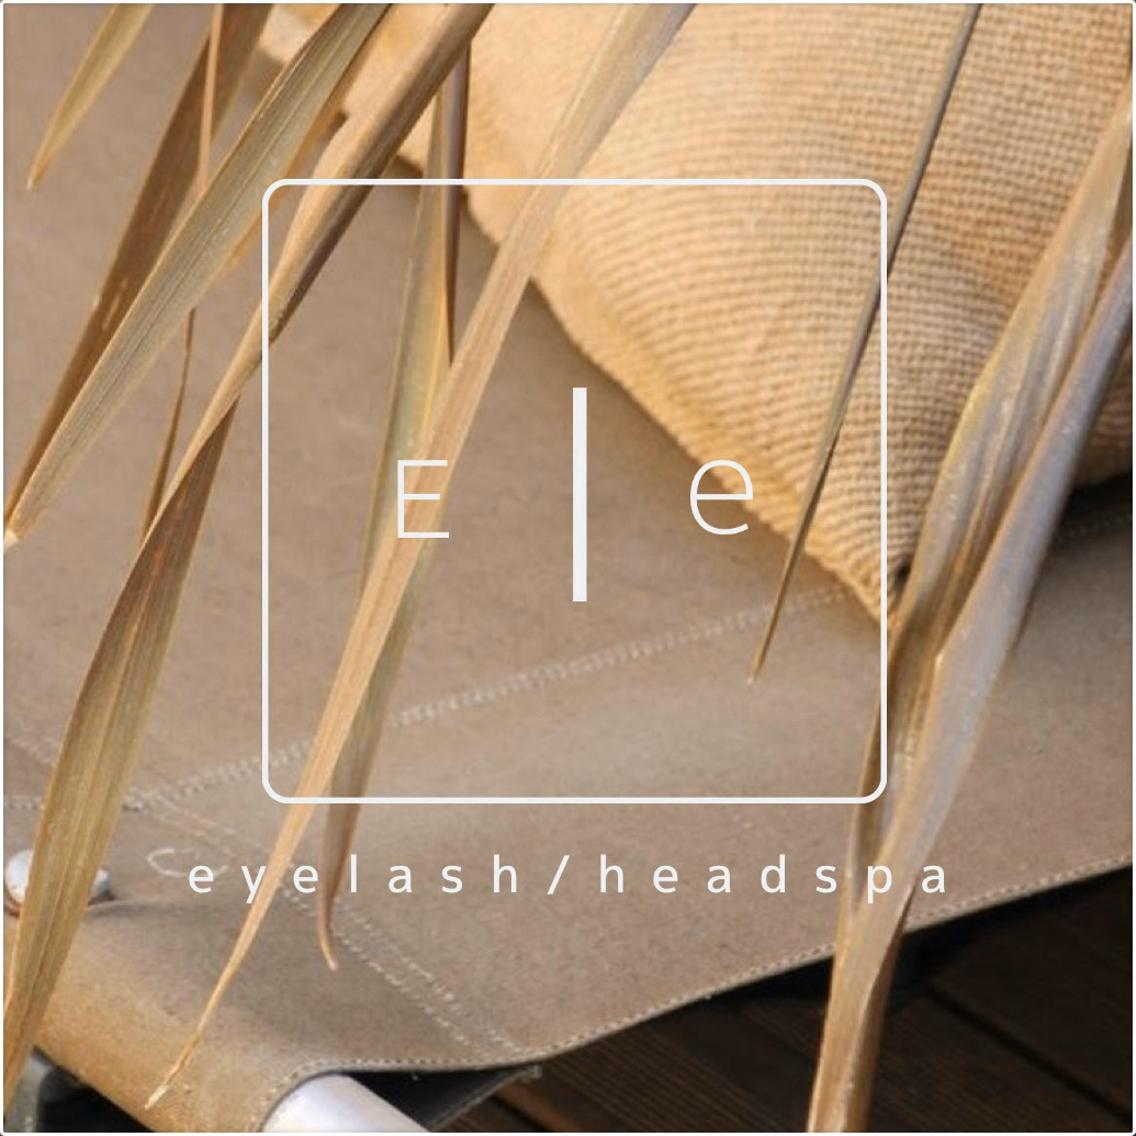 Eleeyelash&headspa所属・有田 千賀の掲載